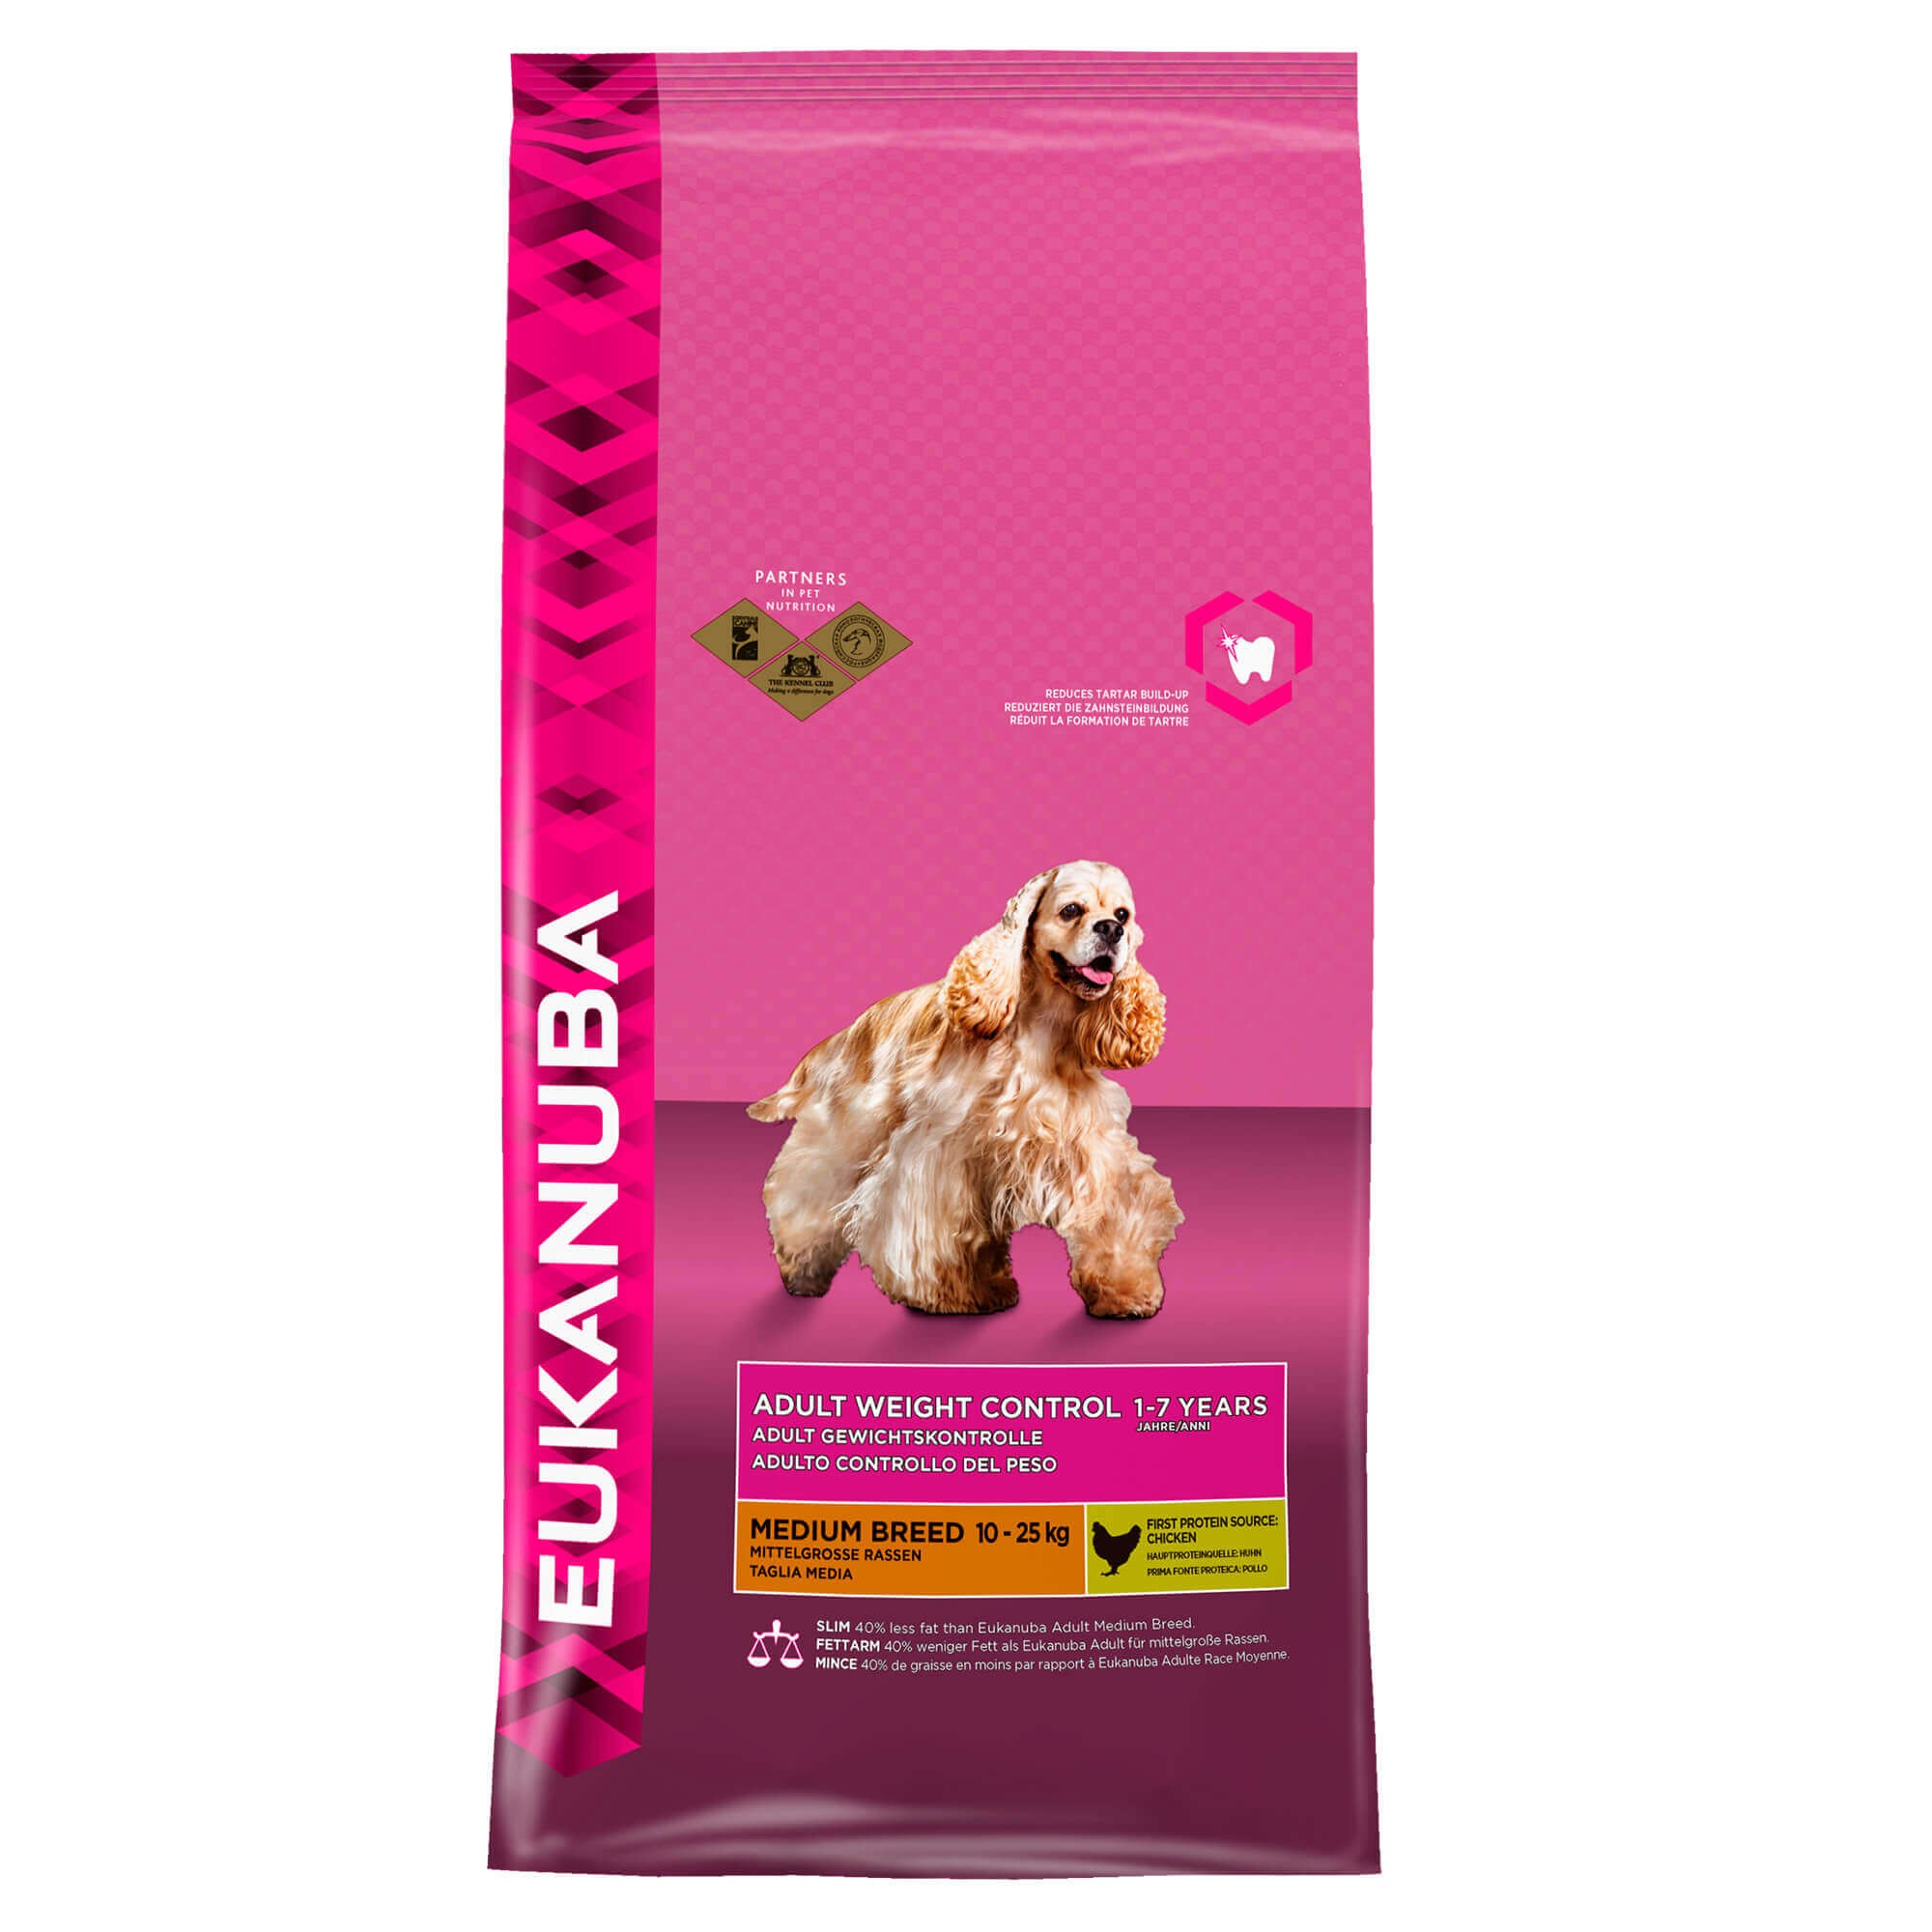 Eukanuba Adult Weight Control Mittelgroβe Rassen Hundefutter